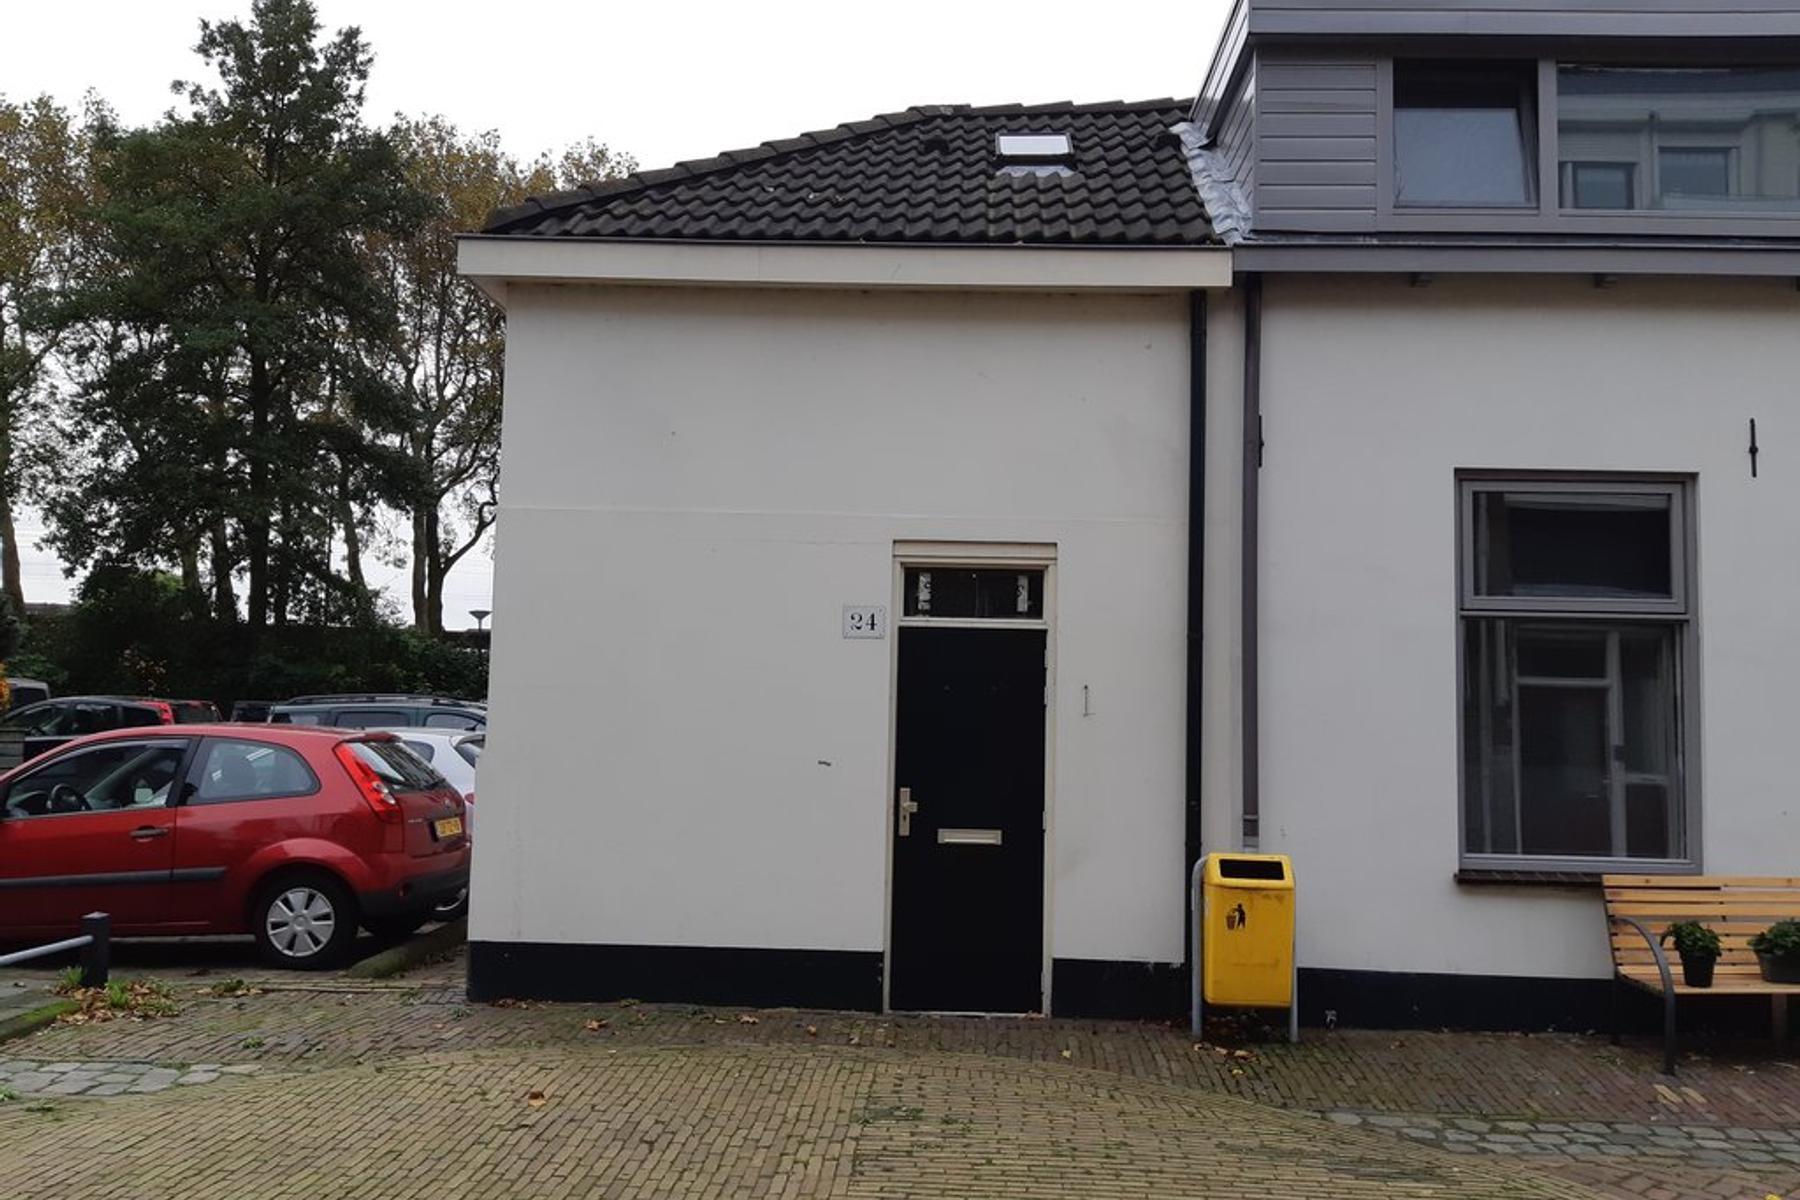 Piet Heinstraat 24 in Maassluis 3143 AK